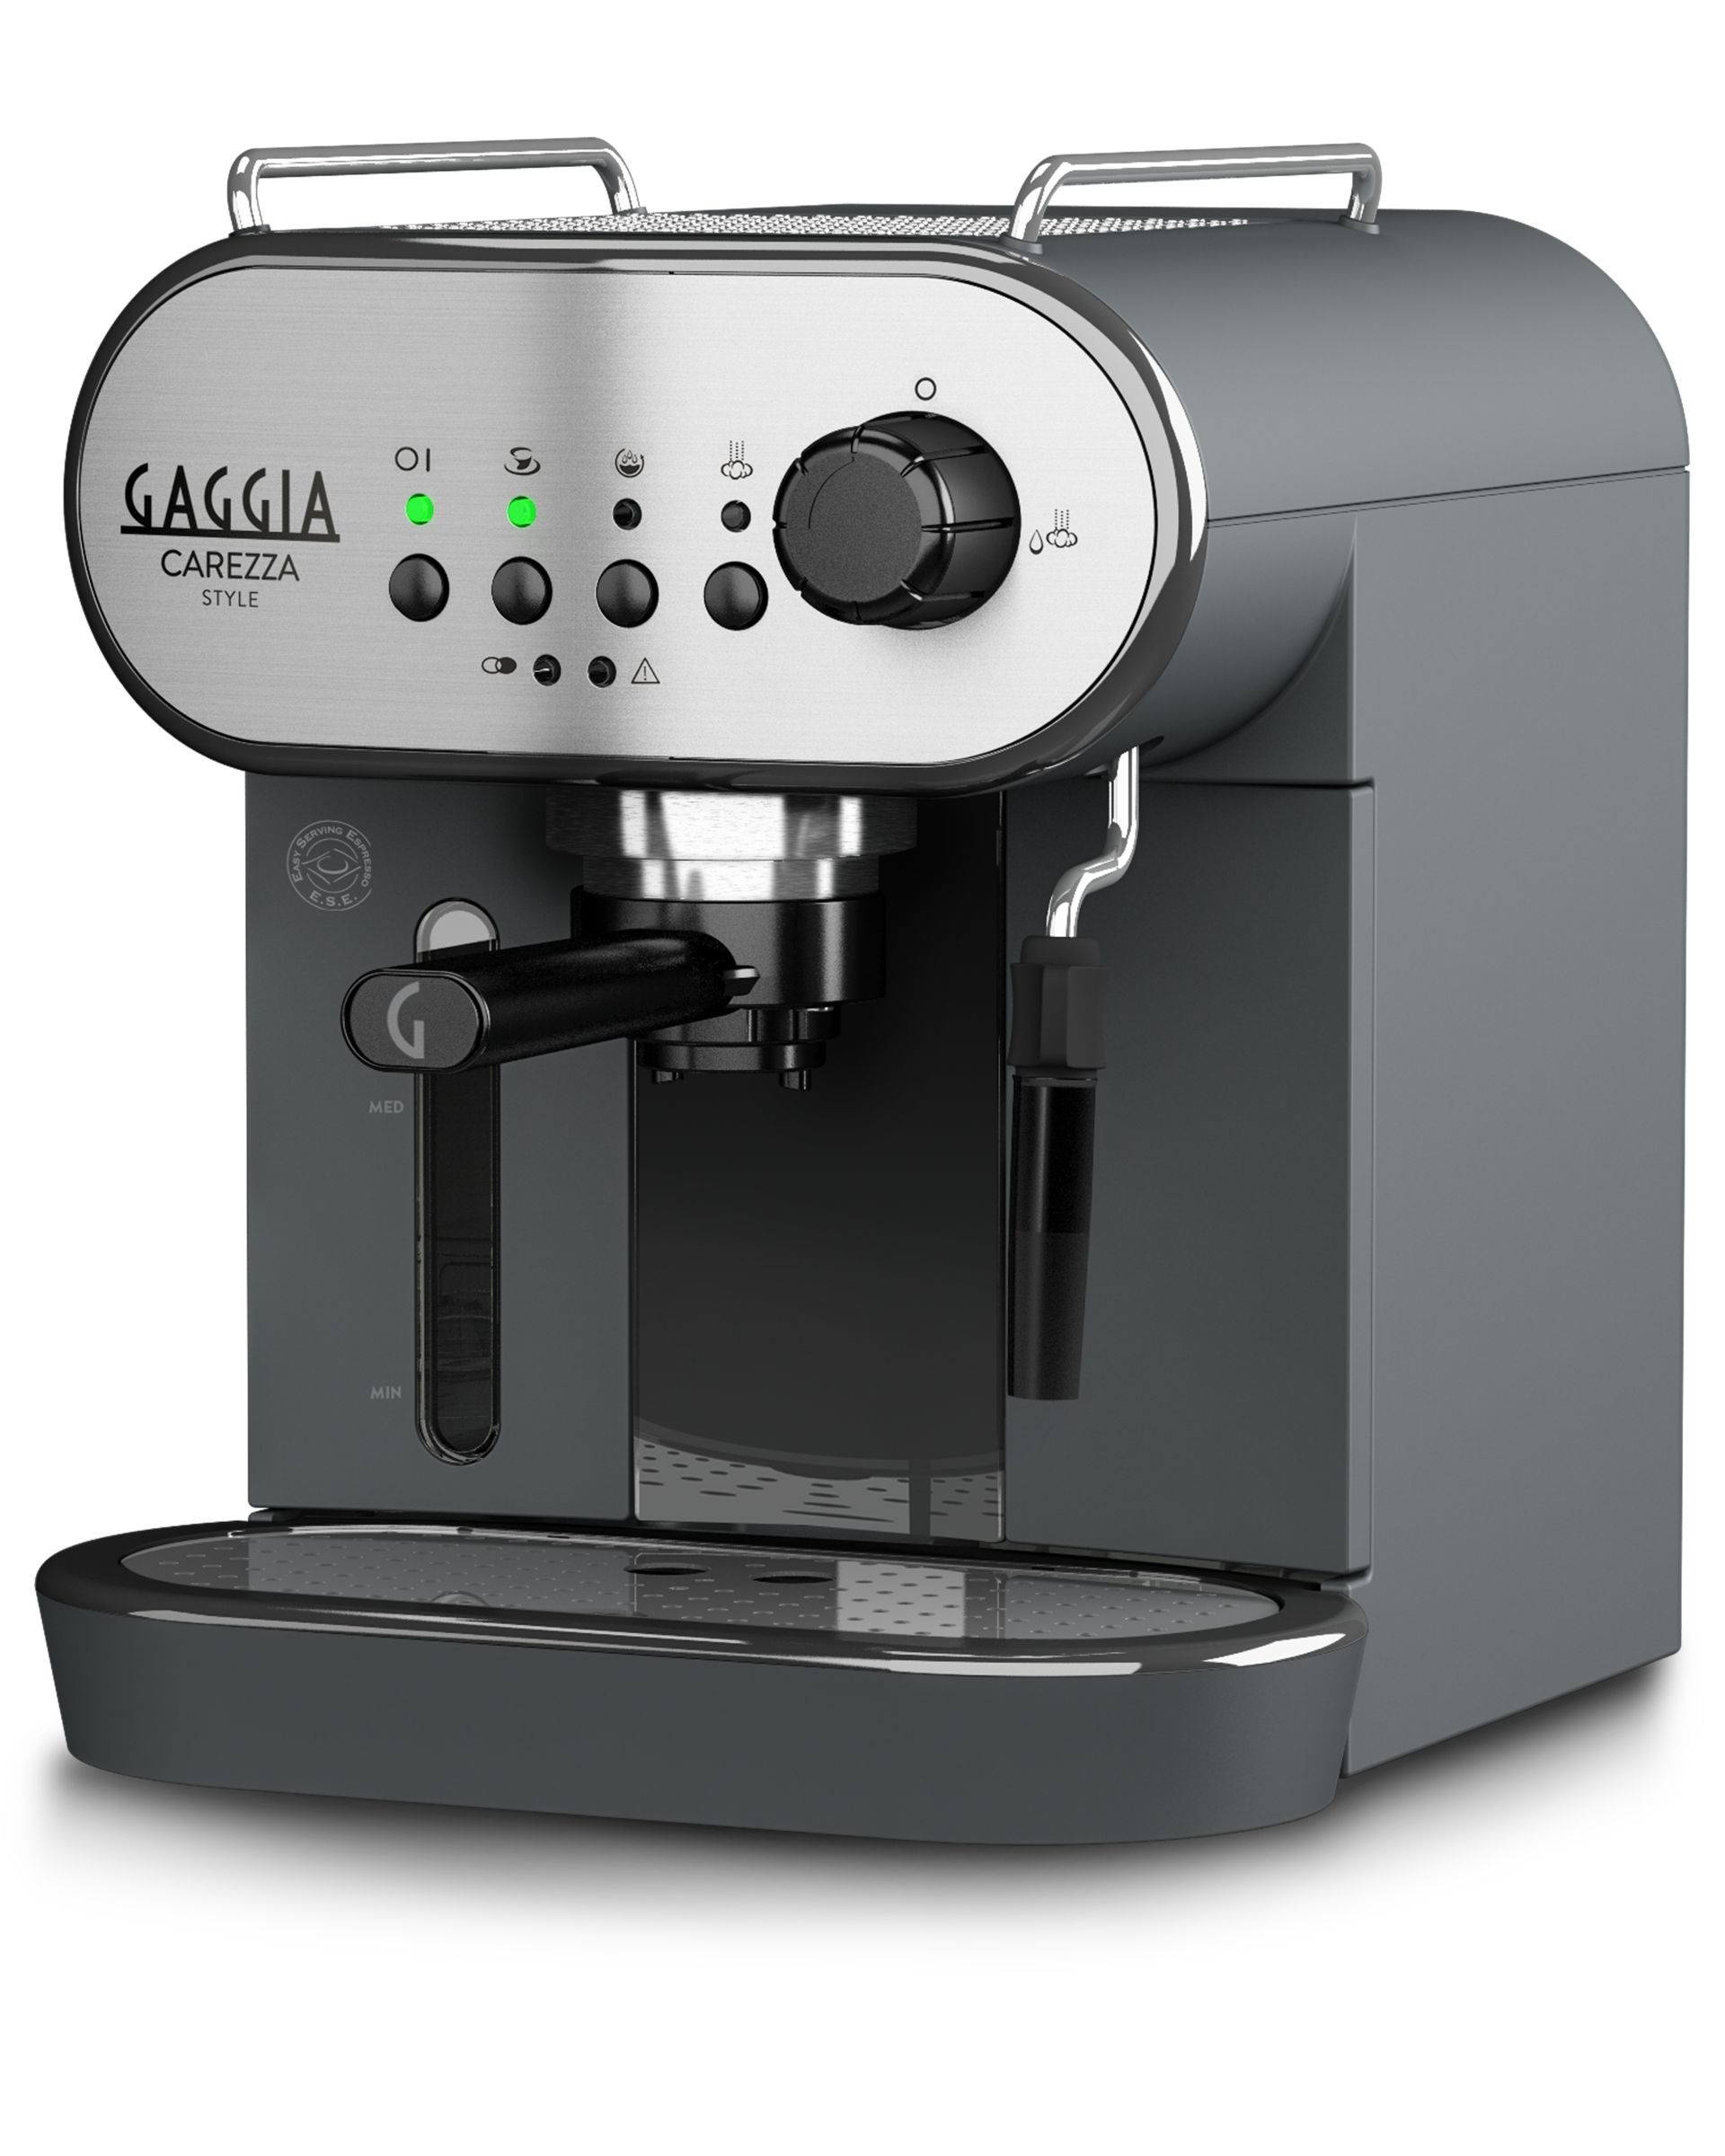 Gaggia espresso apparaat Carezza zwart